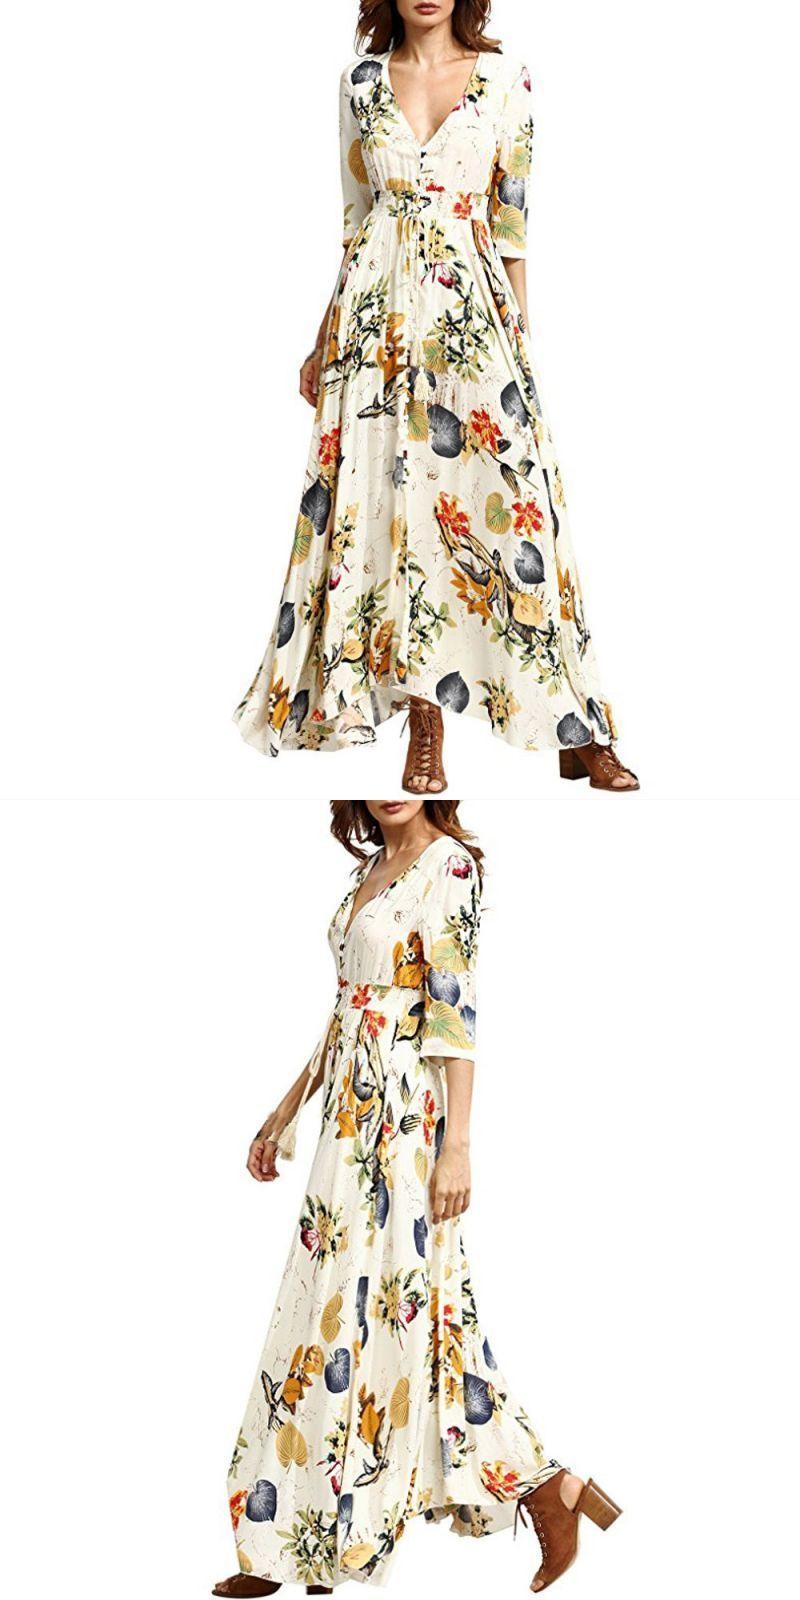 114a98e903 Sexy women long dress bohemia short sleeve elegant dresses floral print  beach party casual dress 2018